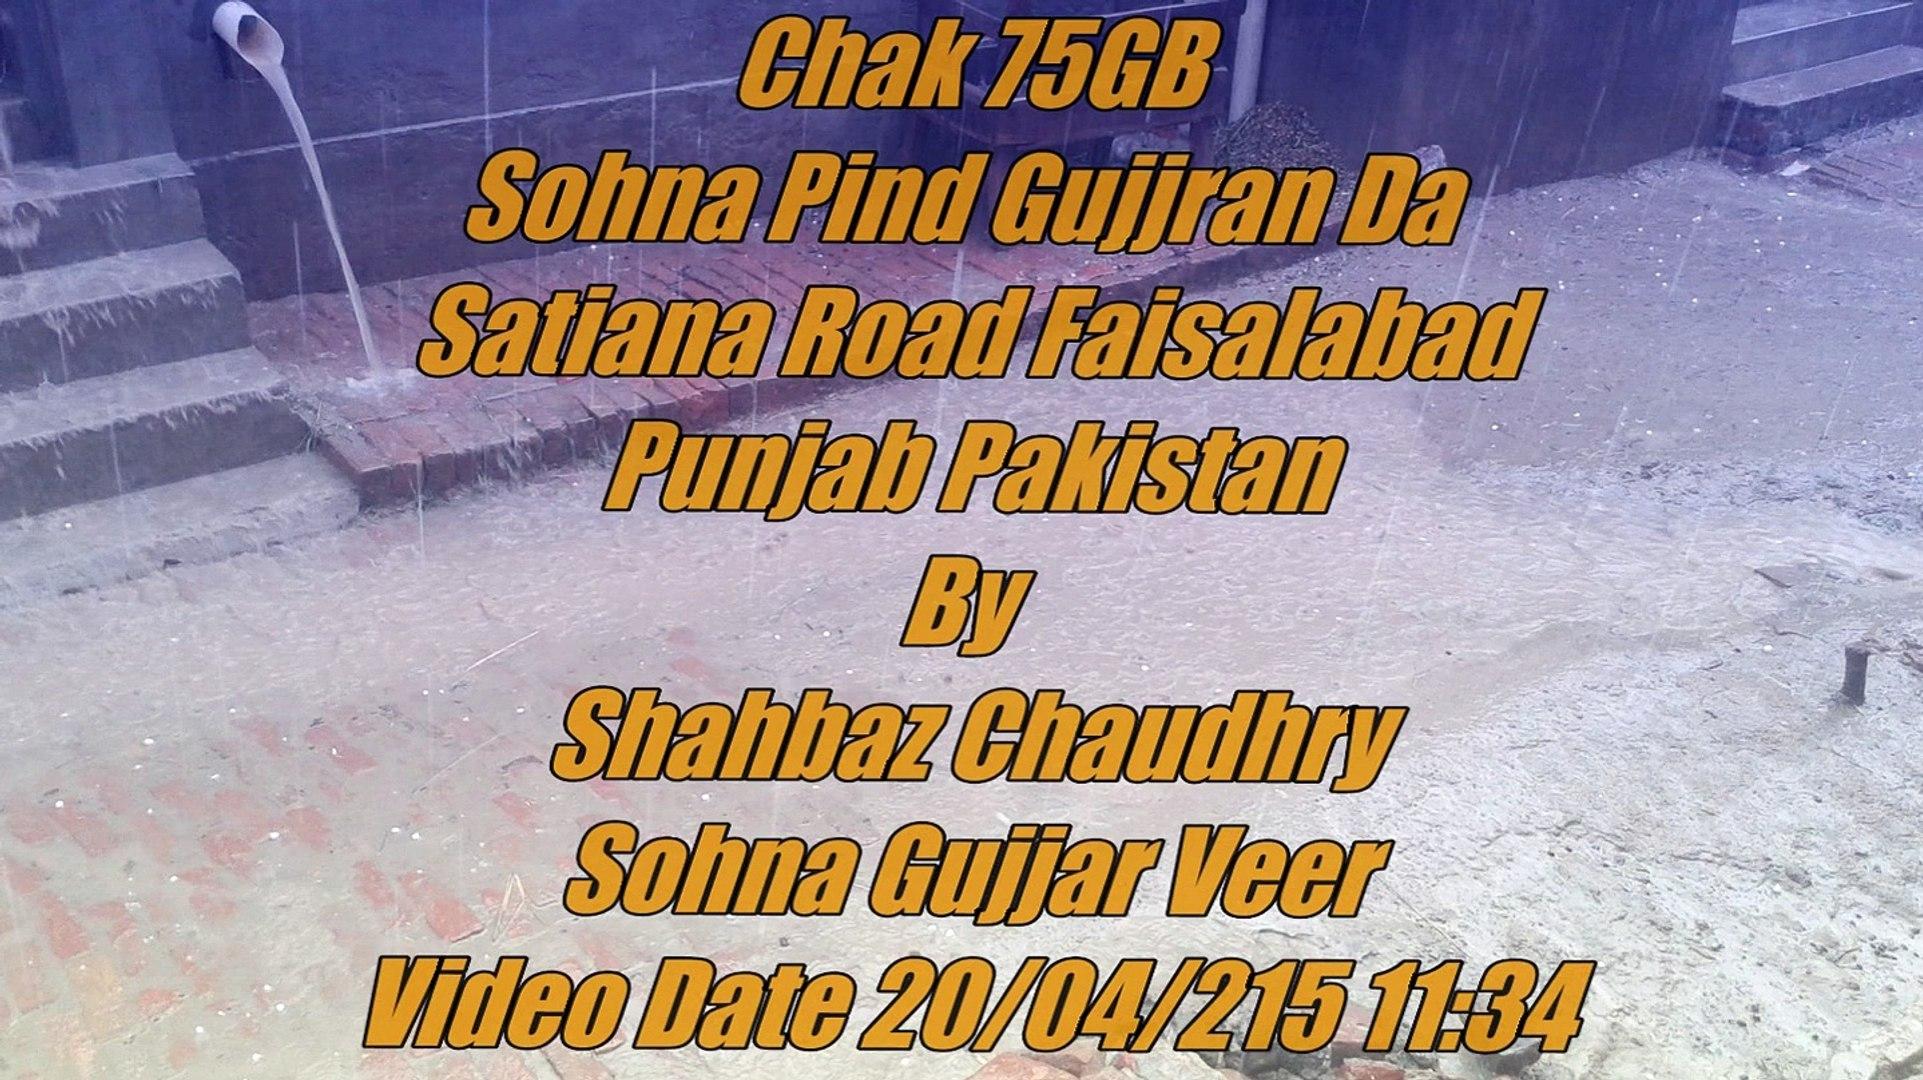 New Punjabi Video || پنڈ وچ بارش دا ناظرہ || Village Life Pakistan